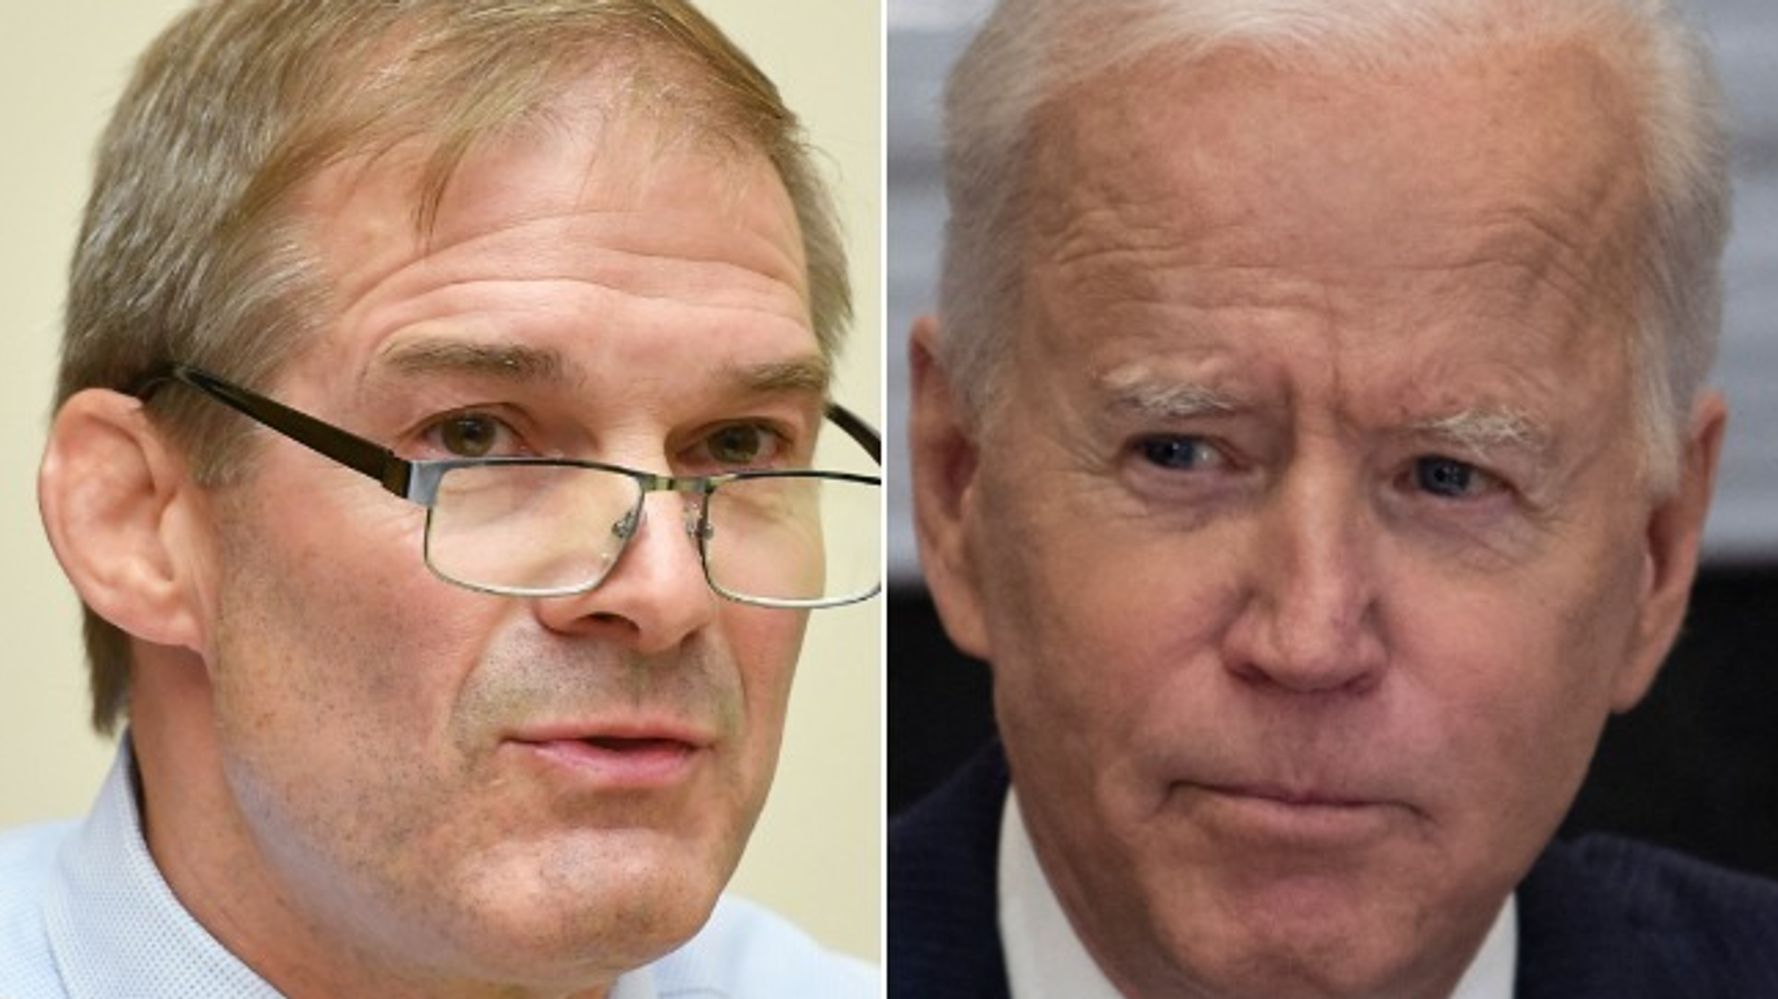 Jim Jordan's Dishonest 'You Choose' Attack On Biden Spectacularly Backfires